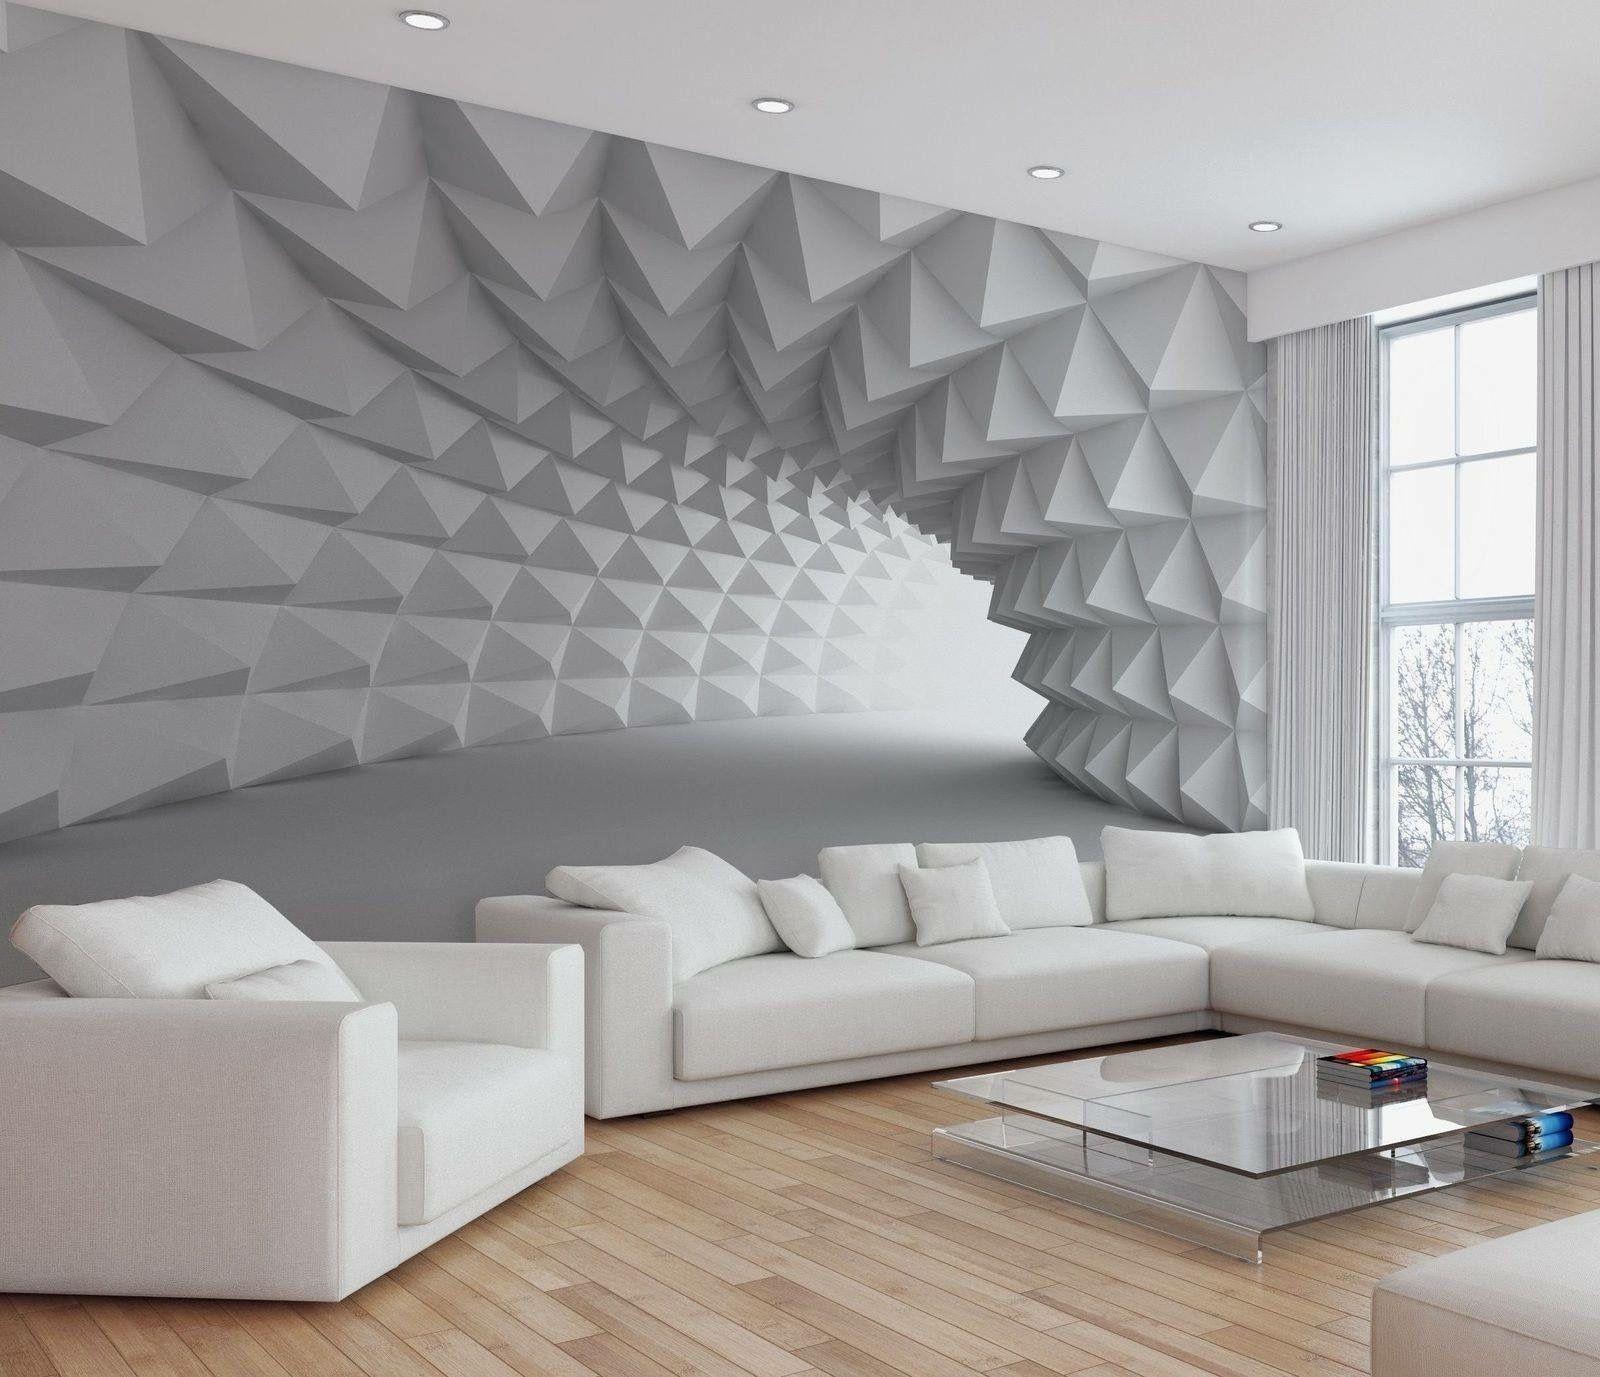 Pin By Samir Megherbi On Dahouse Living Room Wall Wallpaper Wallpaper Living Room Home Wallpaper